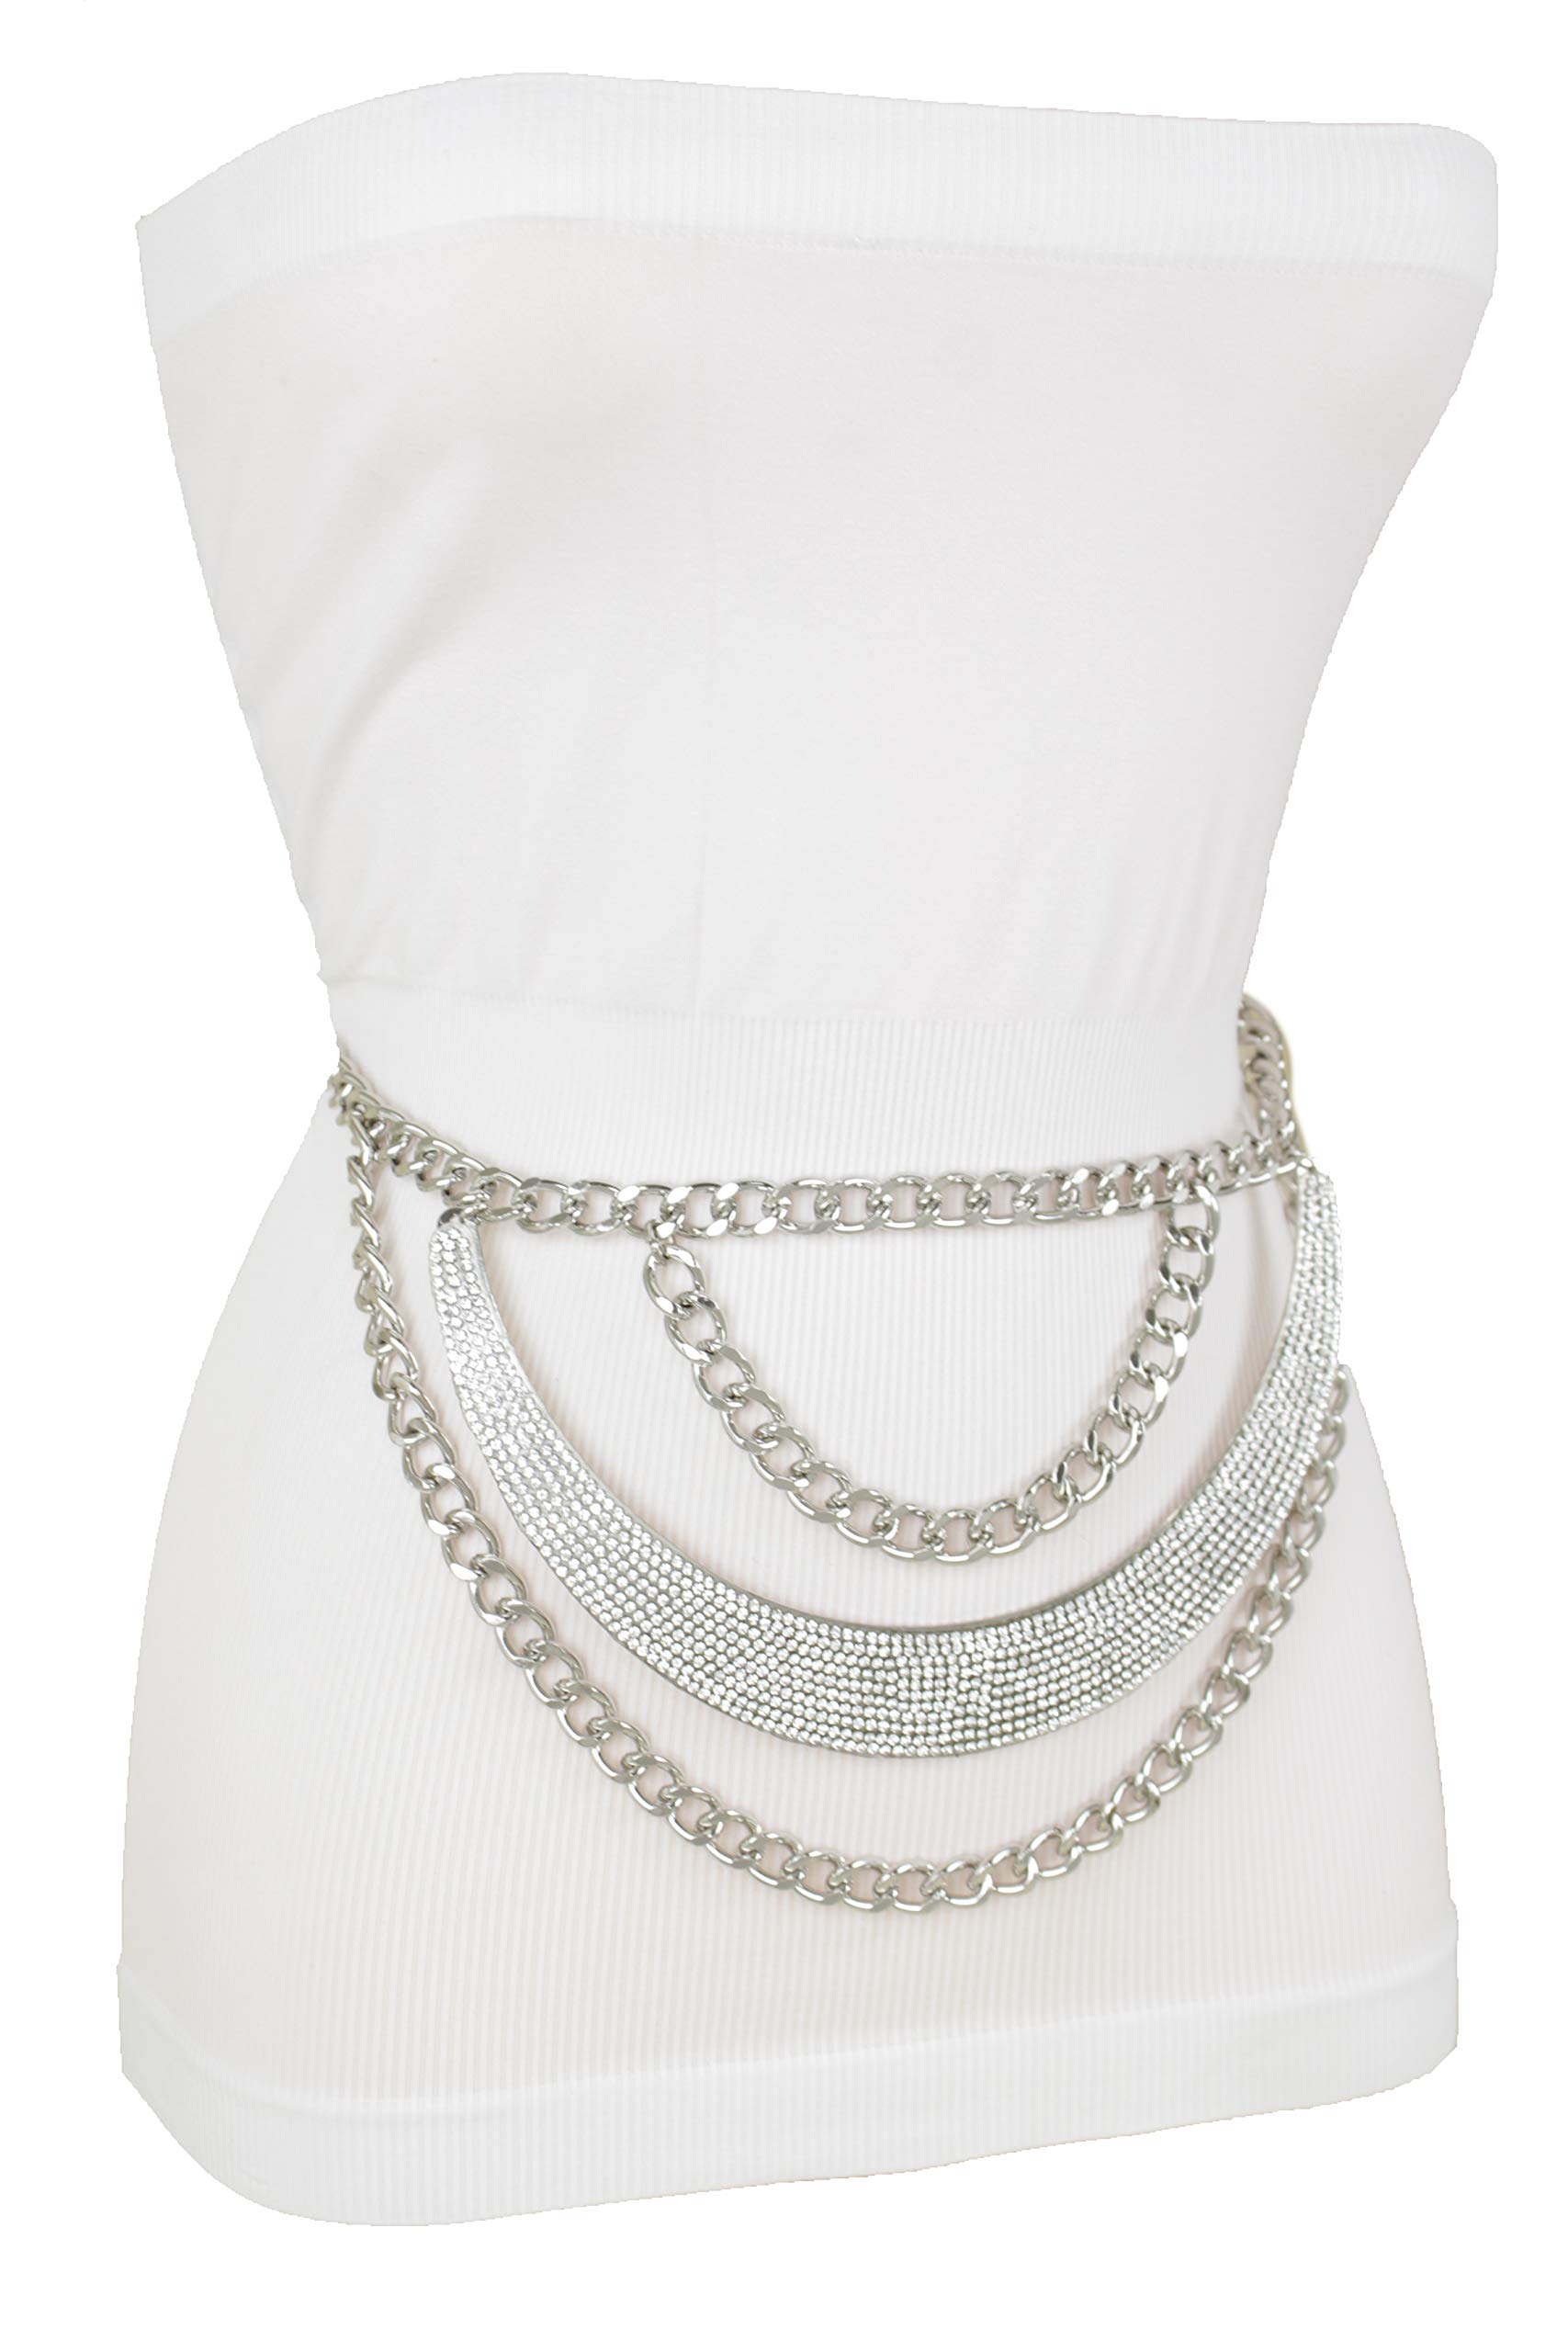 TFJ Women Fashion Dressy Belt Silver Metal Chains Waves Hip Waist Bling Plate XS S M